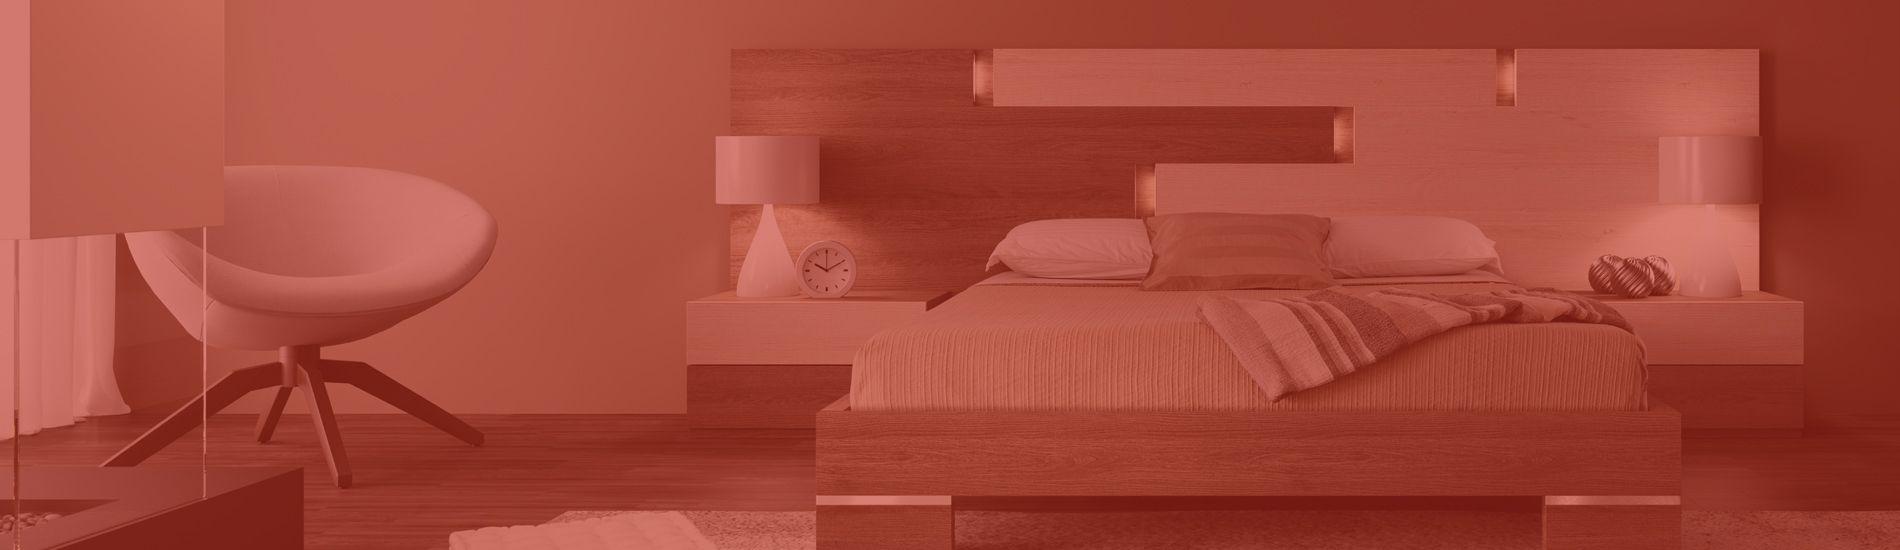 Slide 2|Dormitorios para soñar